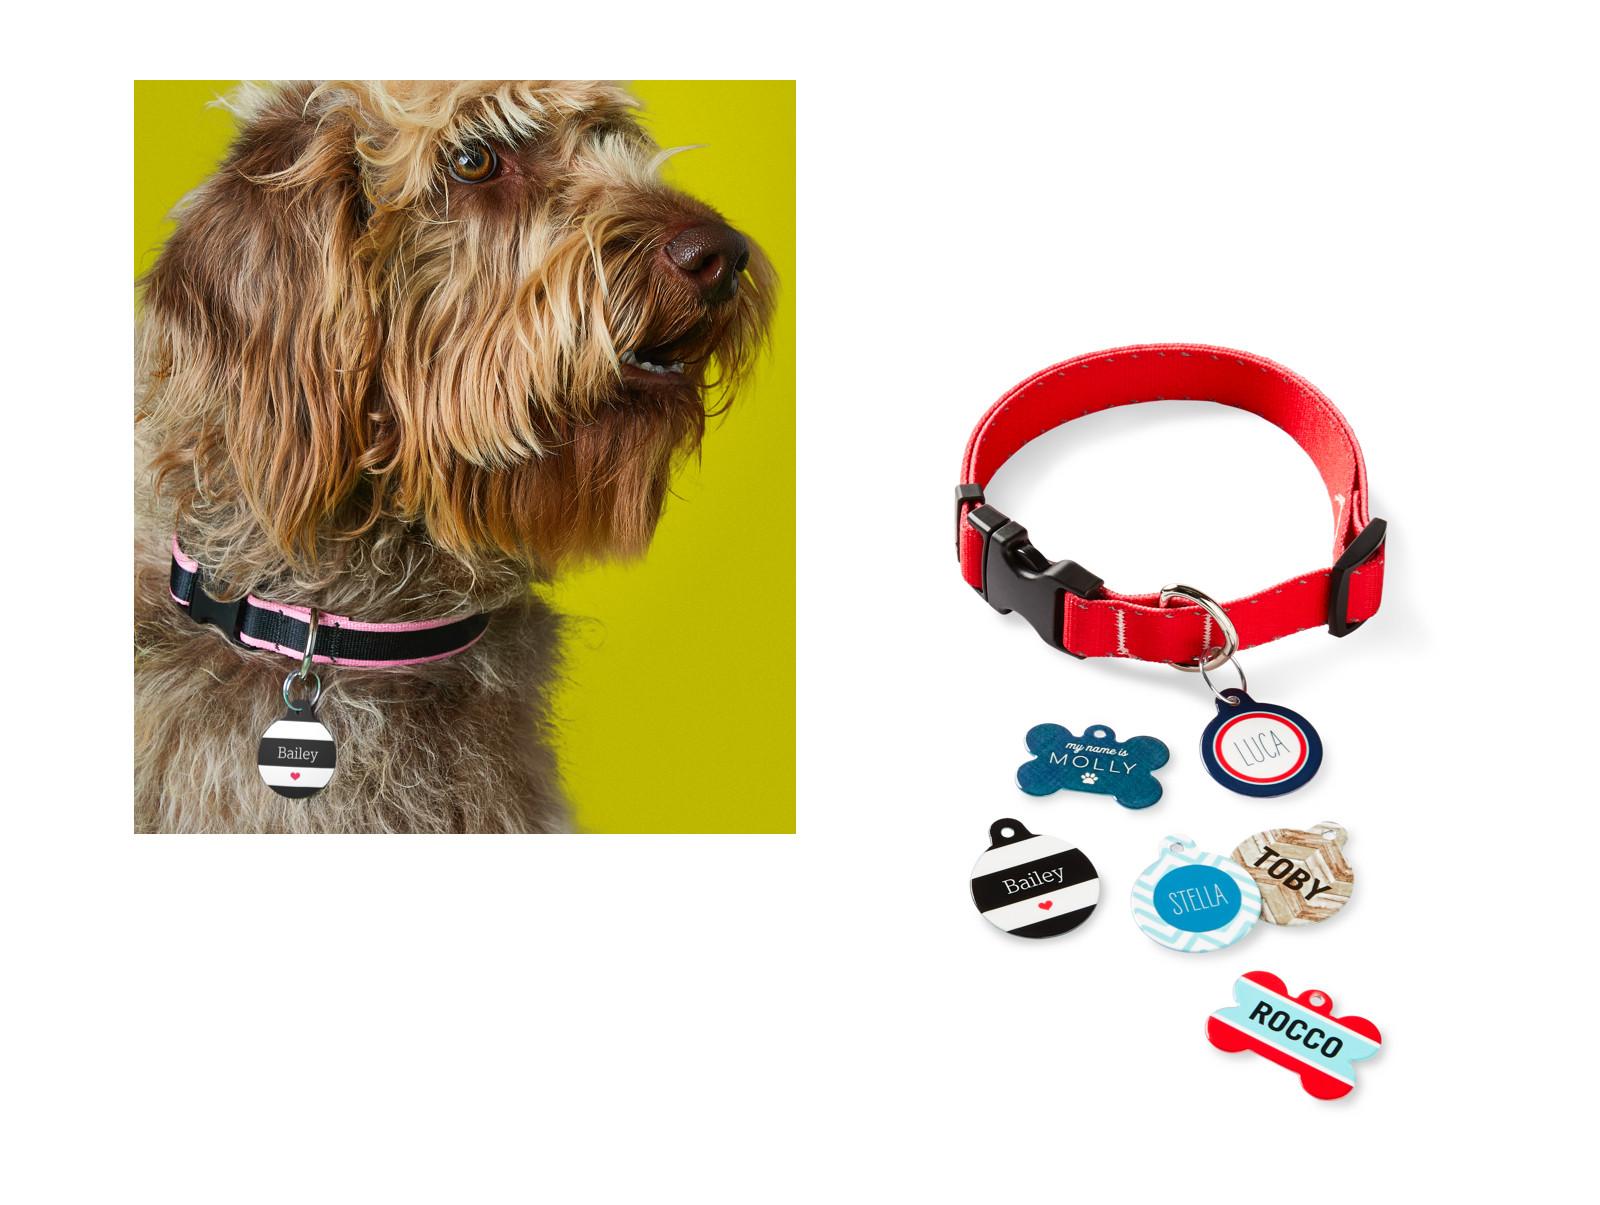 Dog lead leash  The Bailey dog lead